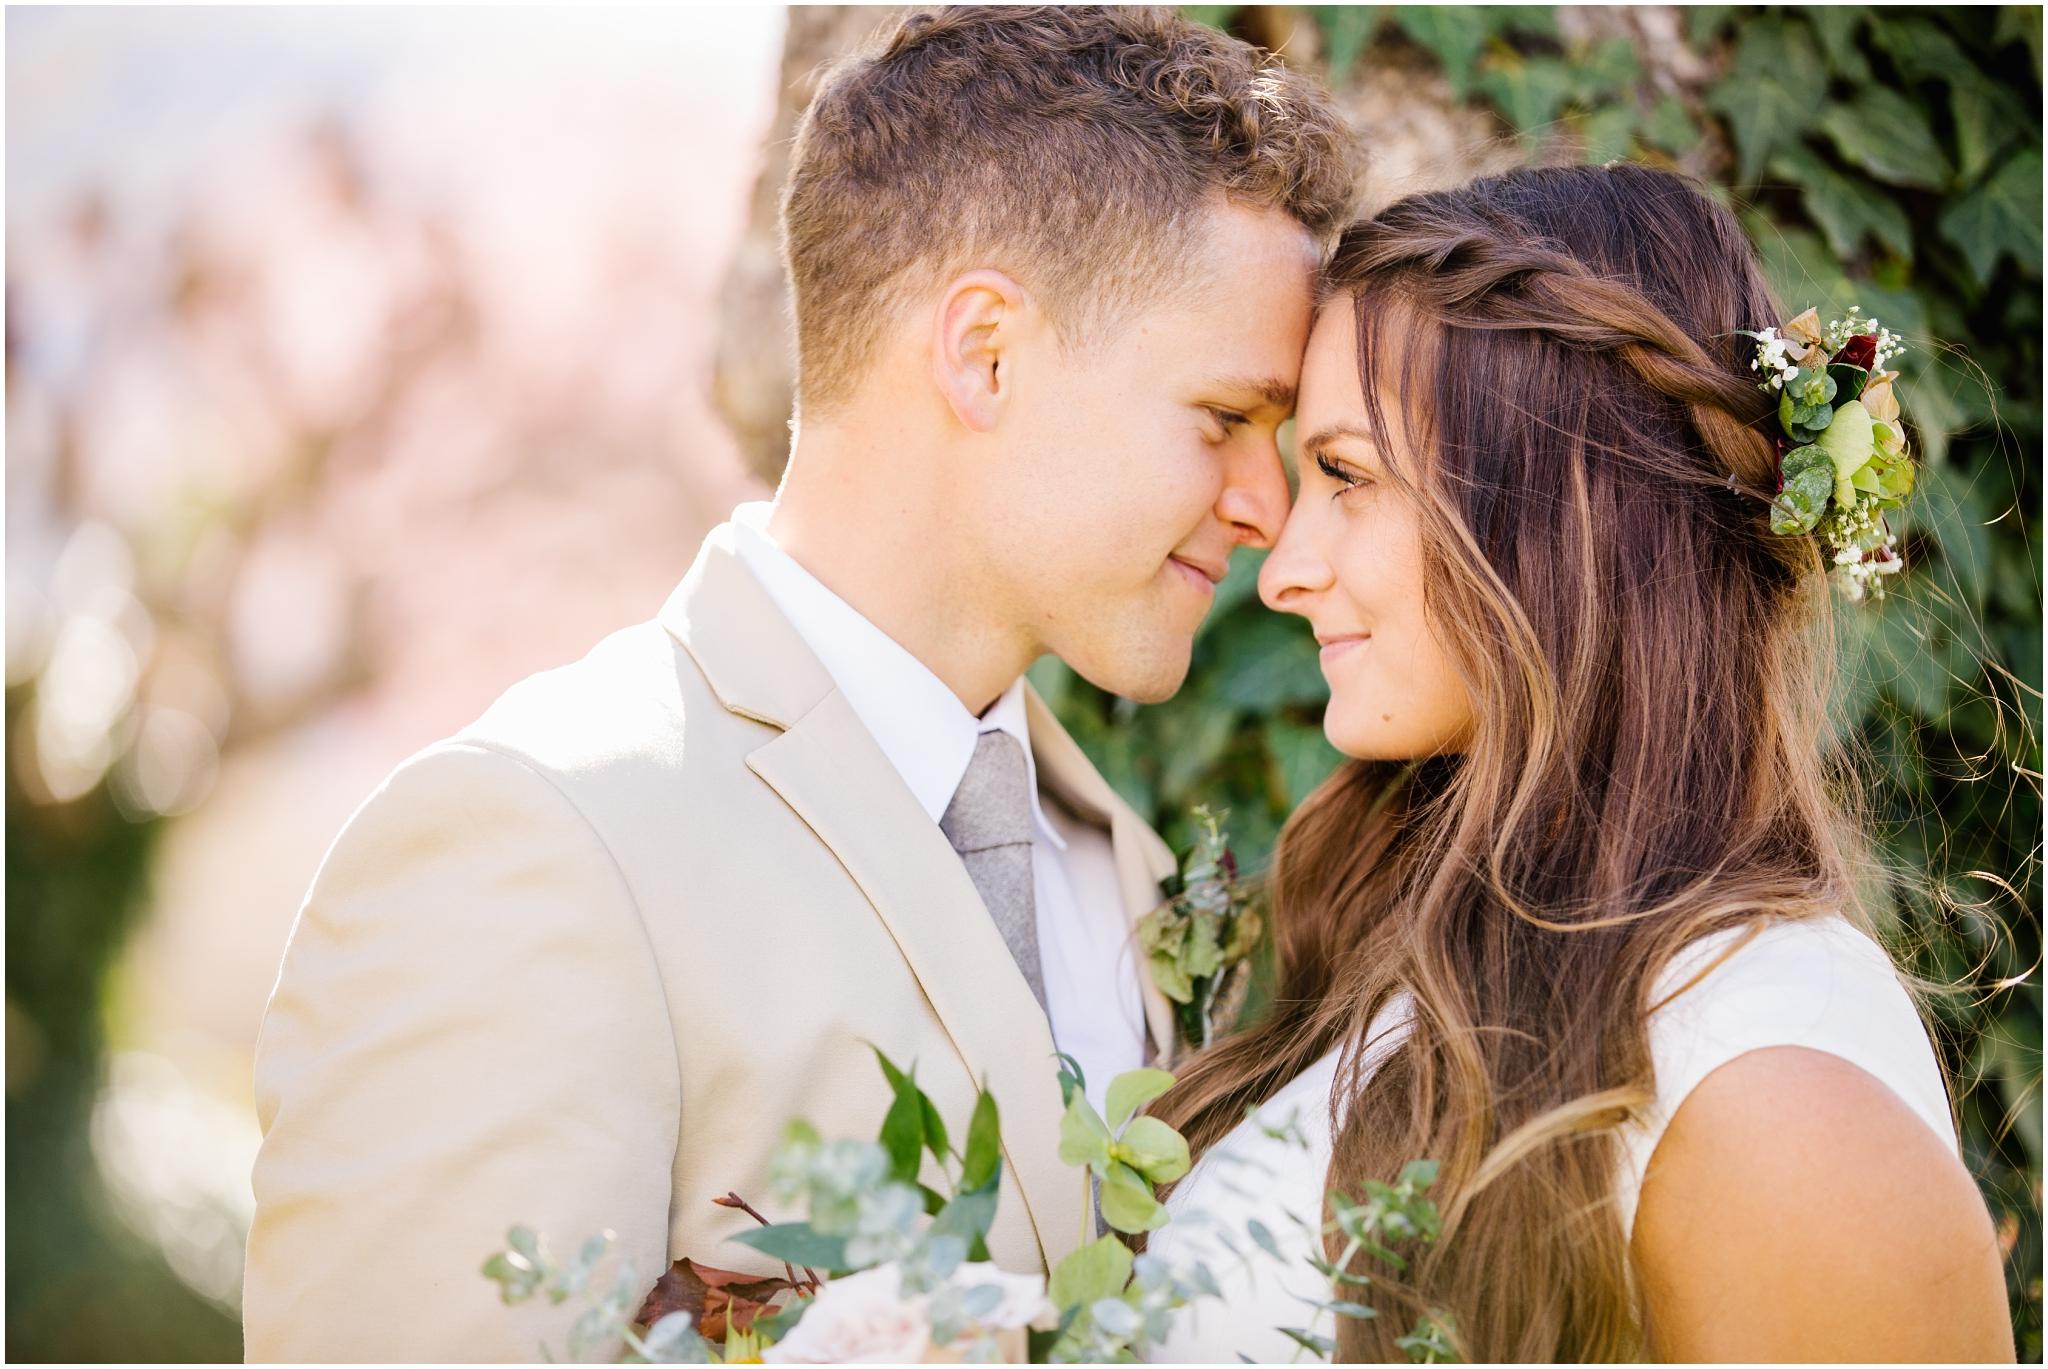 JC-Wedding-156_Lizzie-B-Imagery-Utah-Wedding-Photographer-Salt-Lake-City-Temple-Joseph-Smith-Memorial-Building-Reception.jpg